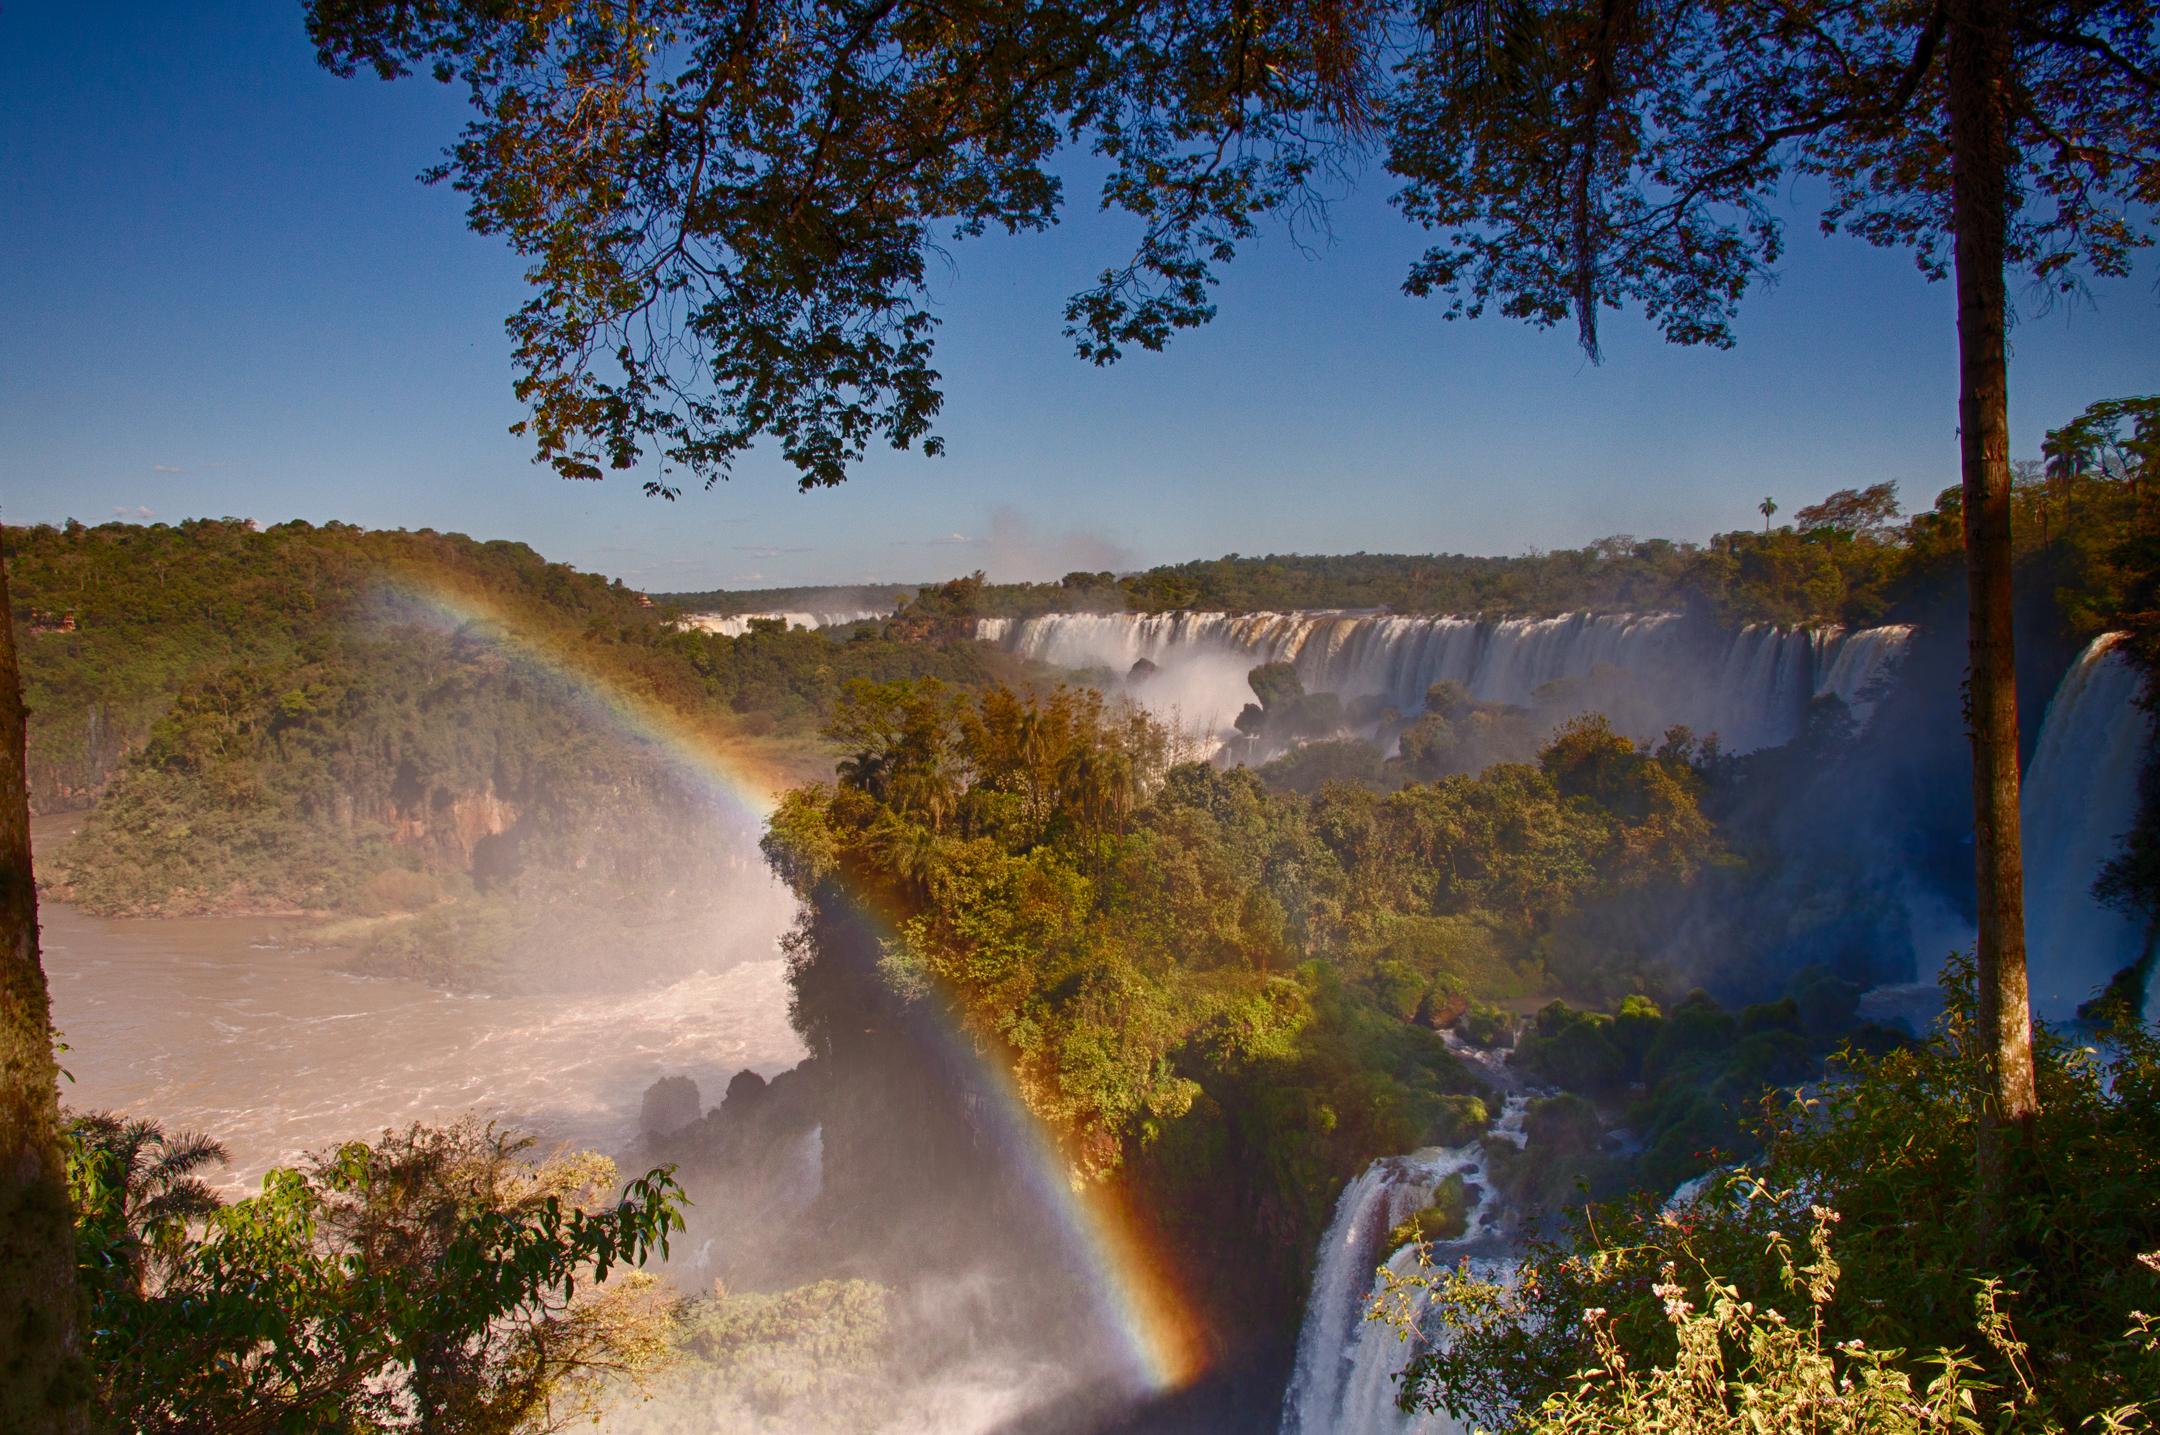 Iguazu Falls, Argentine side